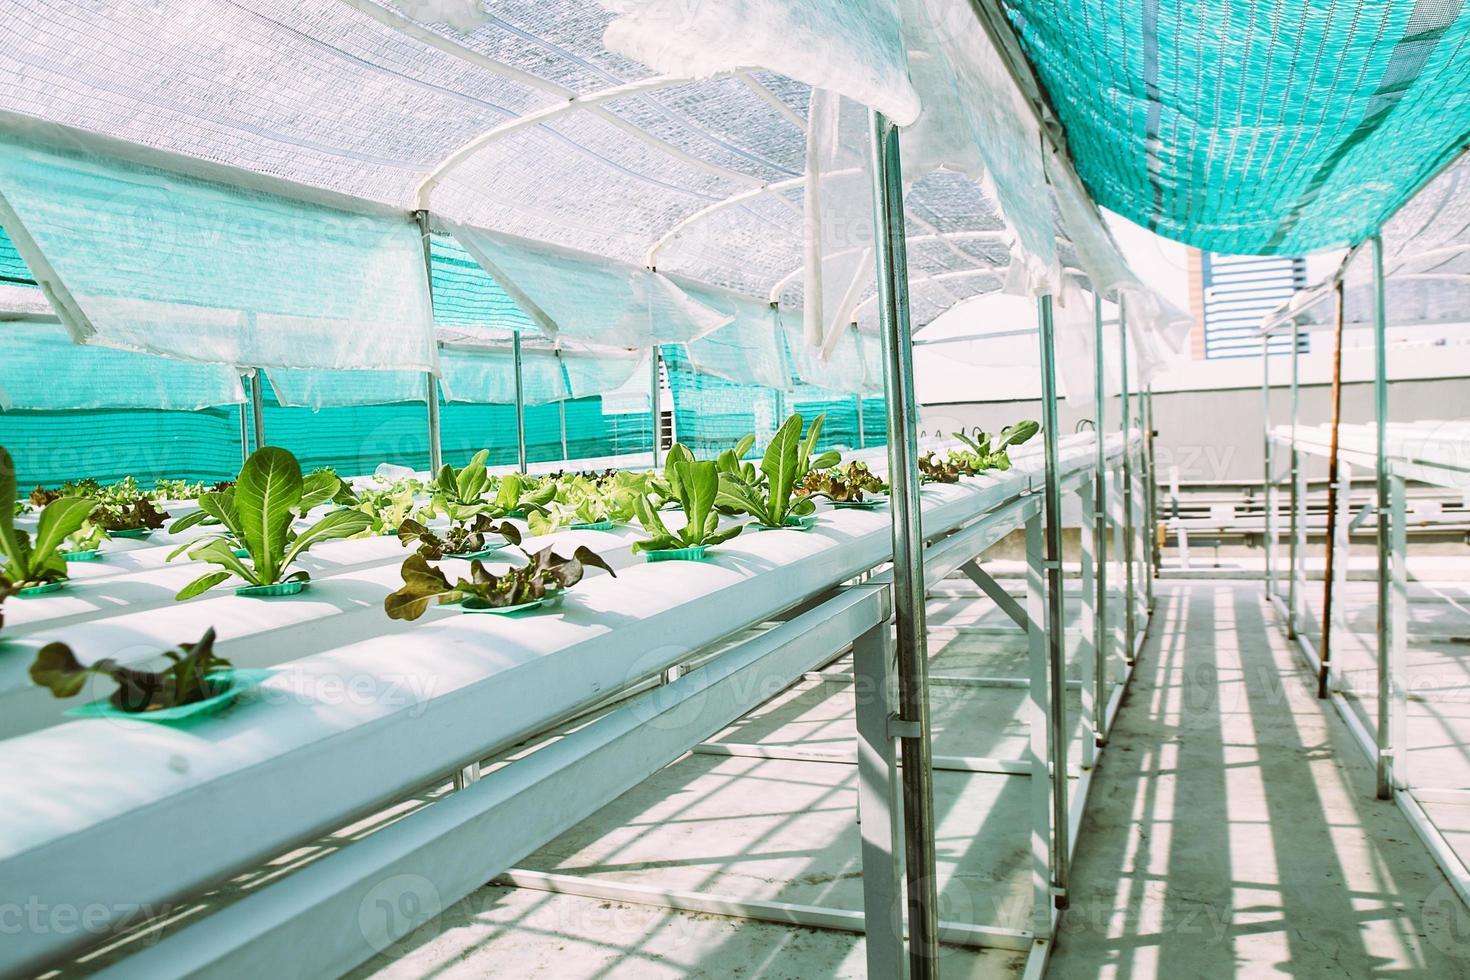 granja hidropónica vegetal verde. foto